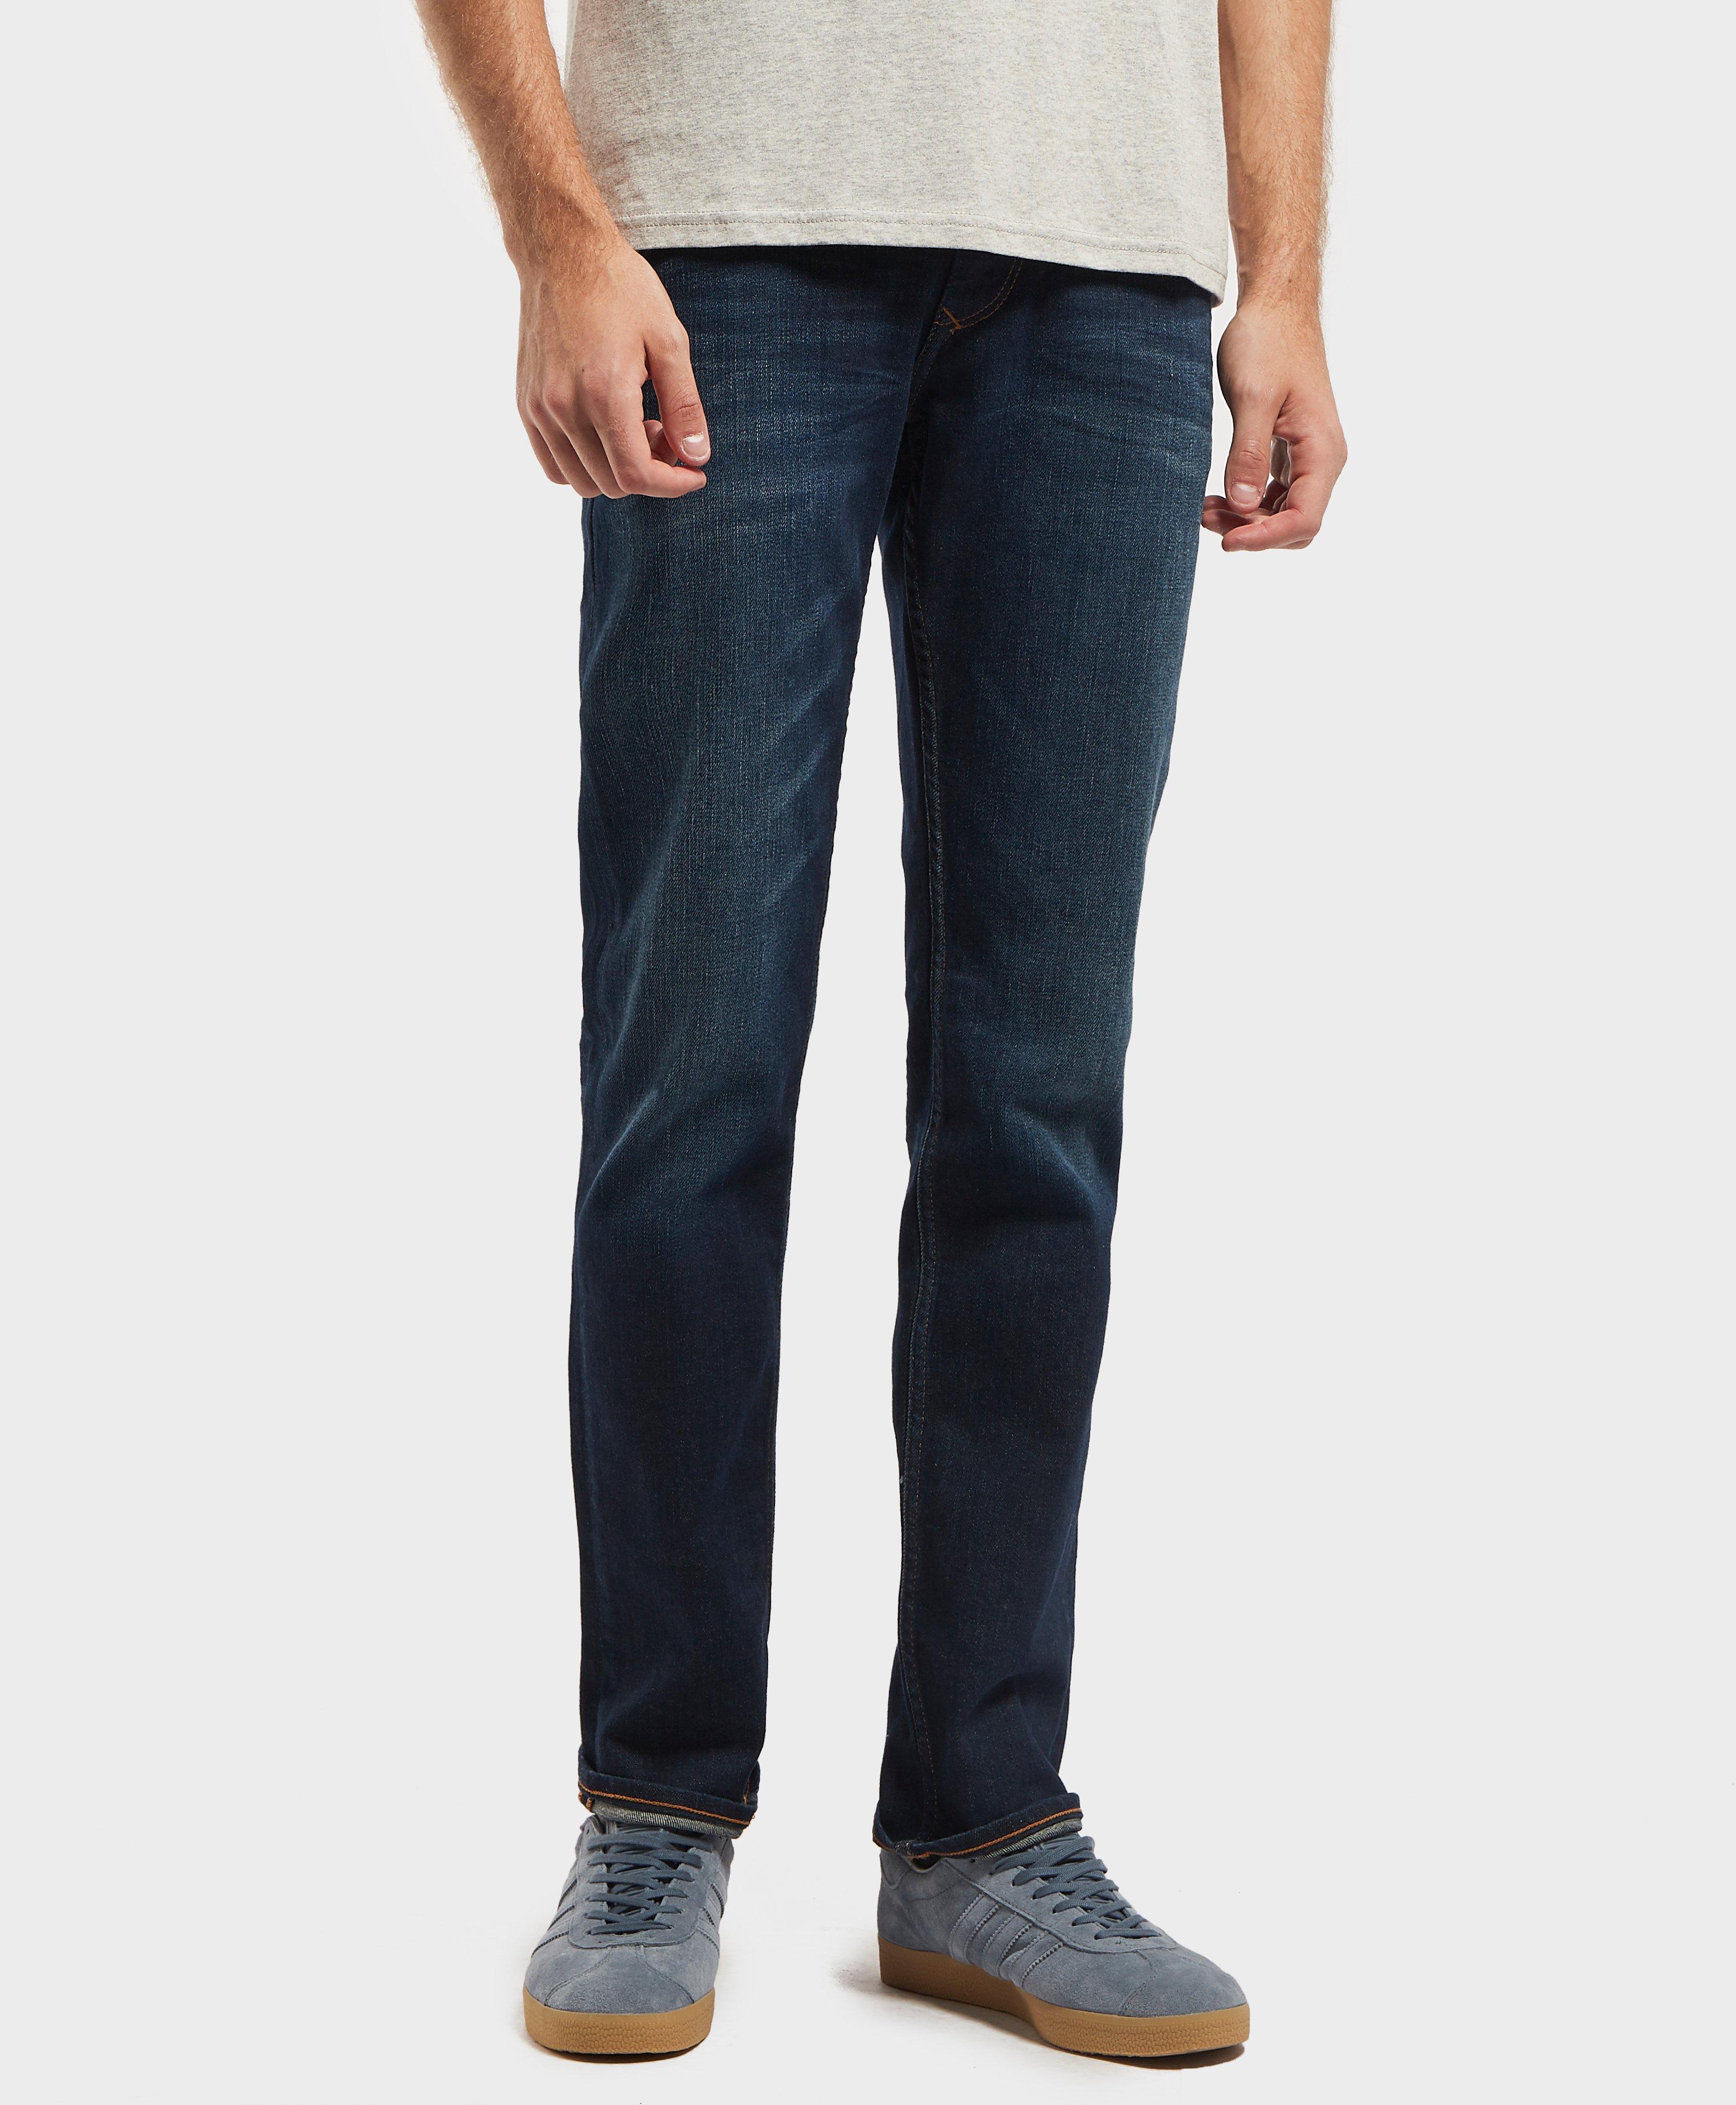 2dd9fff10ca3 Tommy Hilfiger Ryan Regular Straight Jeans in Blue for Men - Lyst